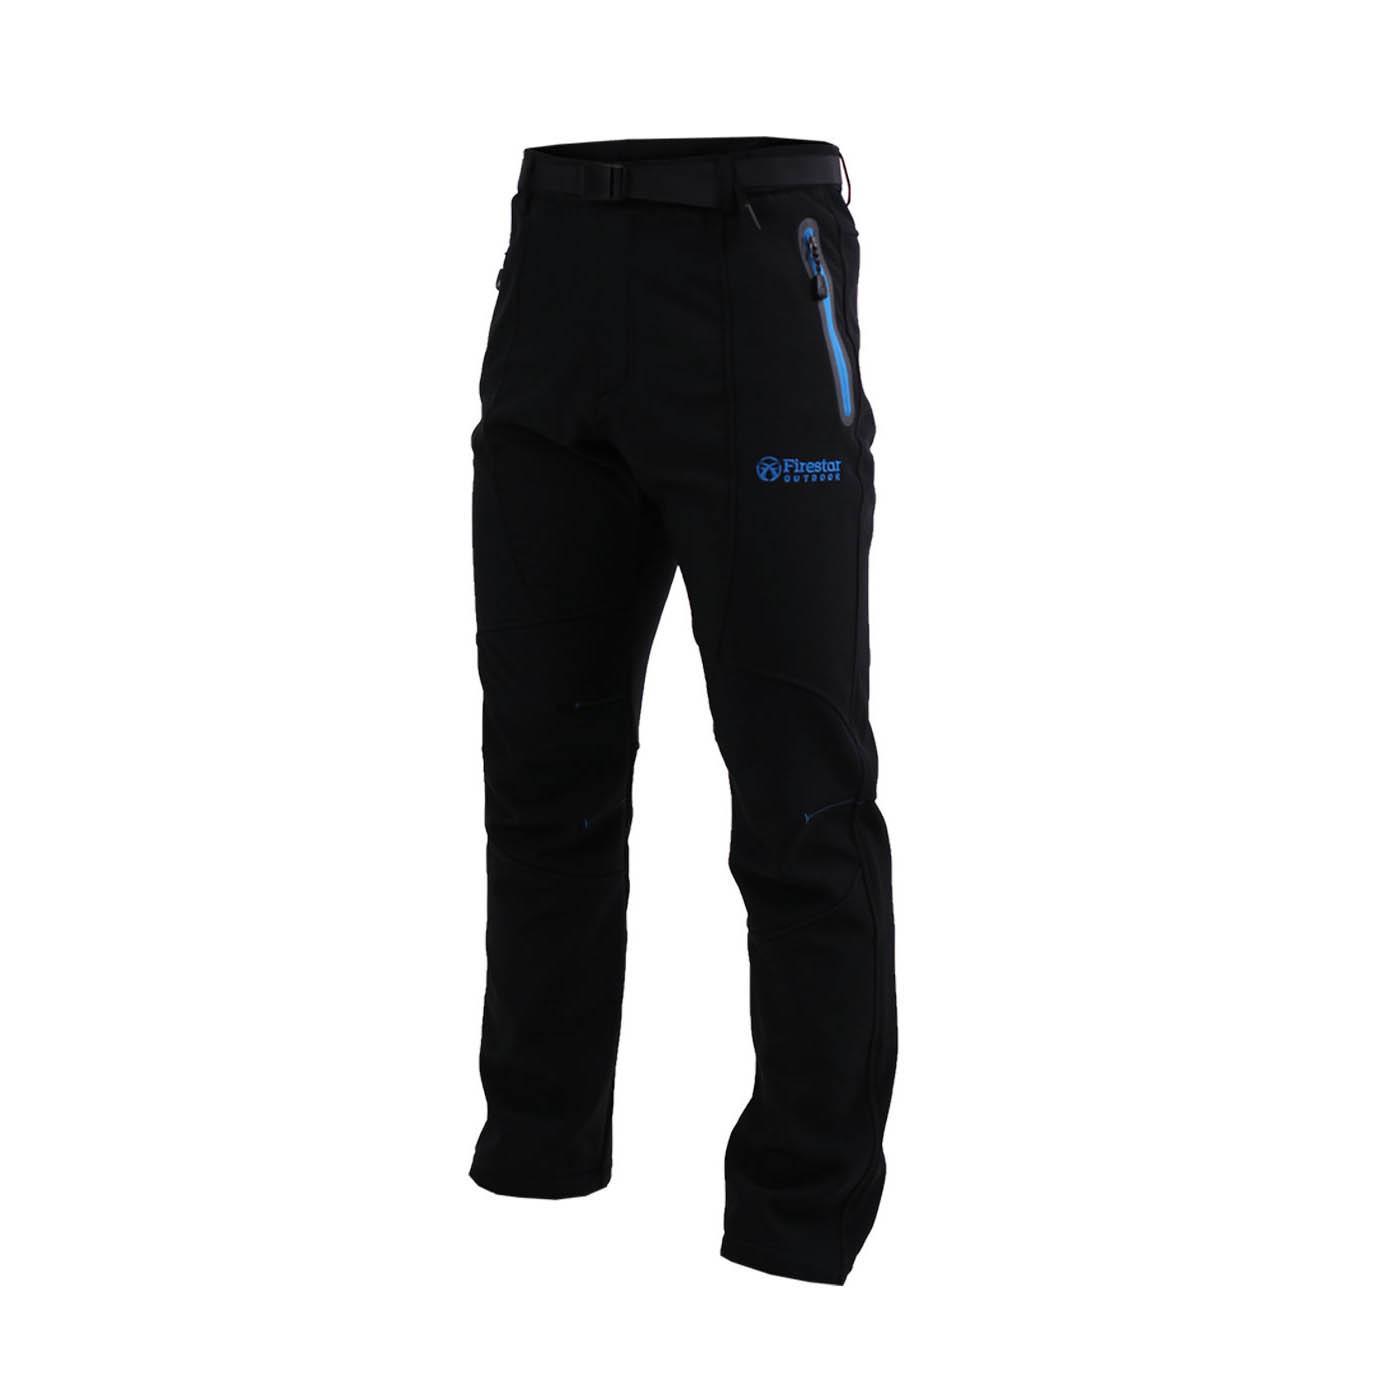 FIRESTAR 男款彈性平織磨毛裏長褲 P6573-40 - 黑寶藍